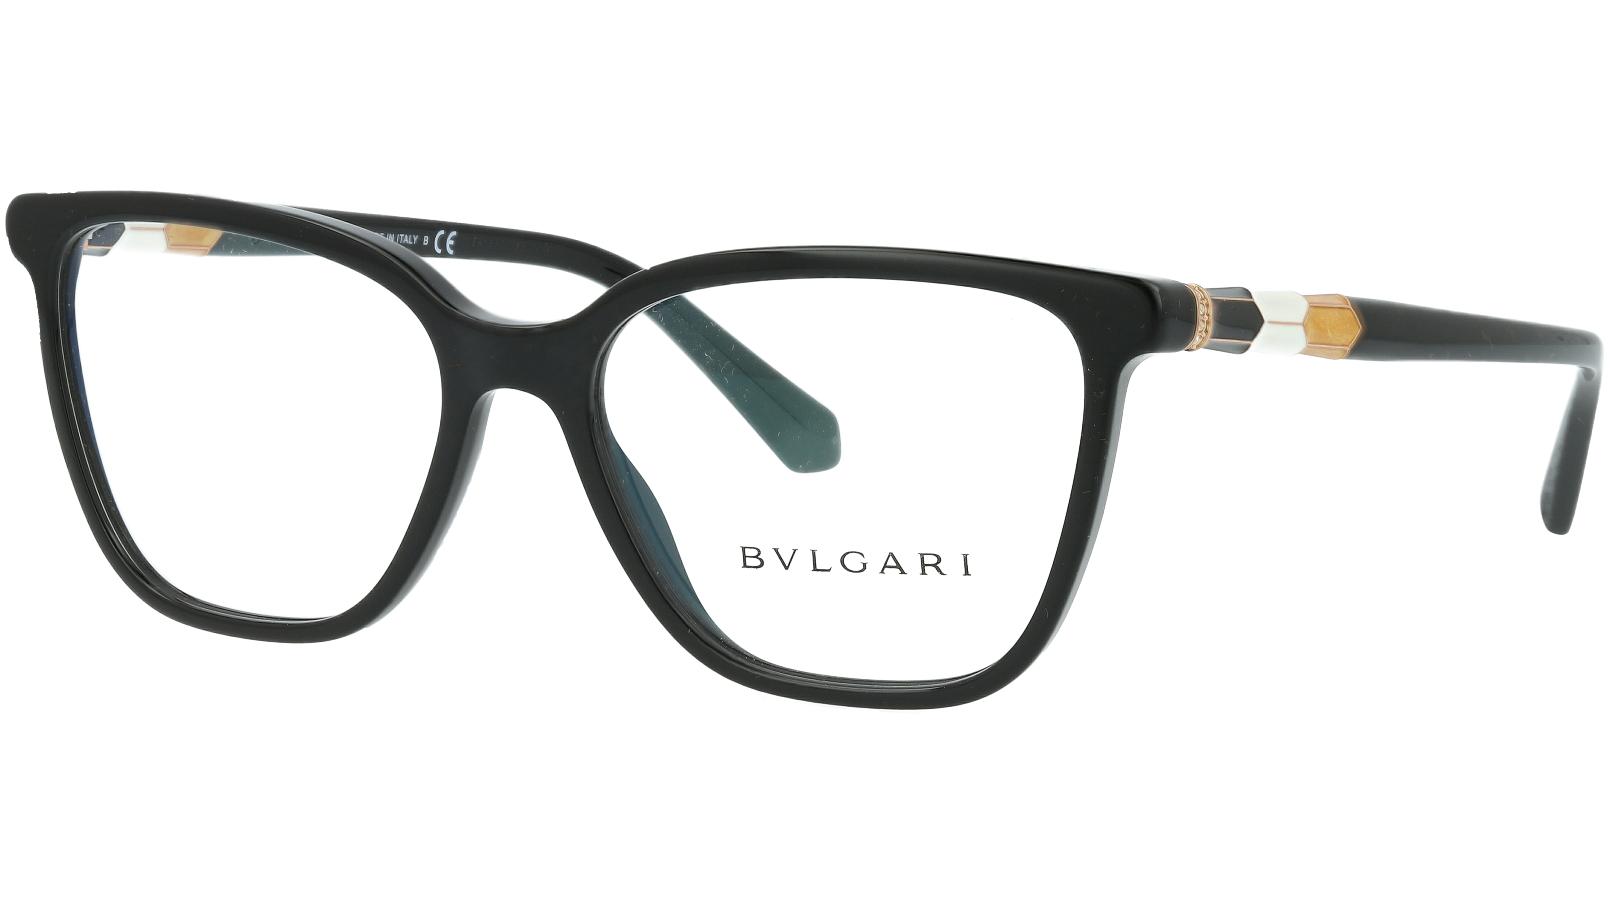 BVLGARI BV4184B 501 54 BLACK Glasses